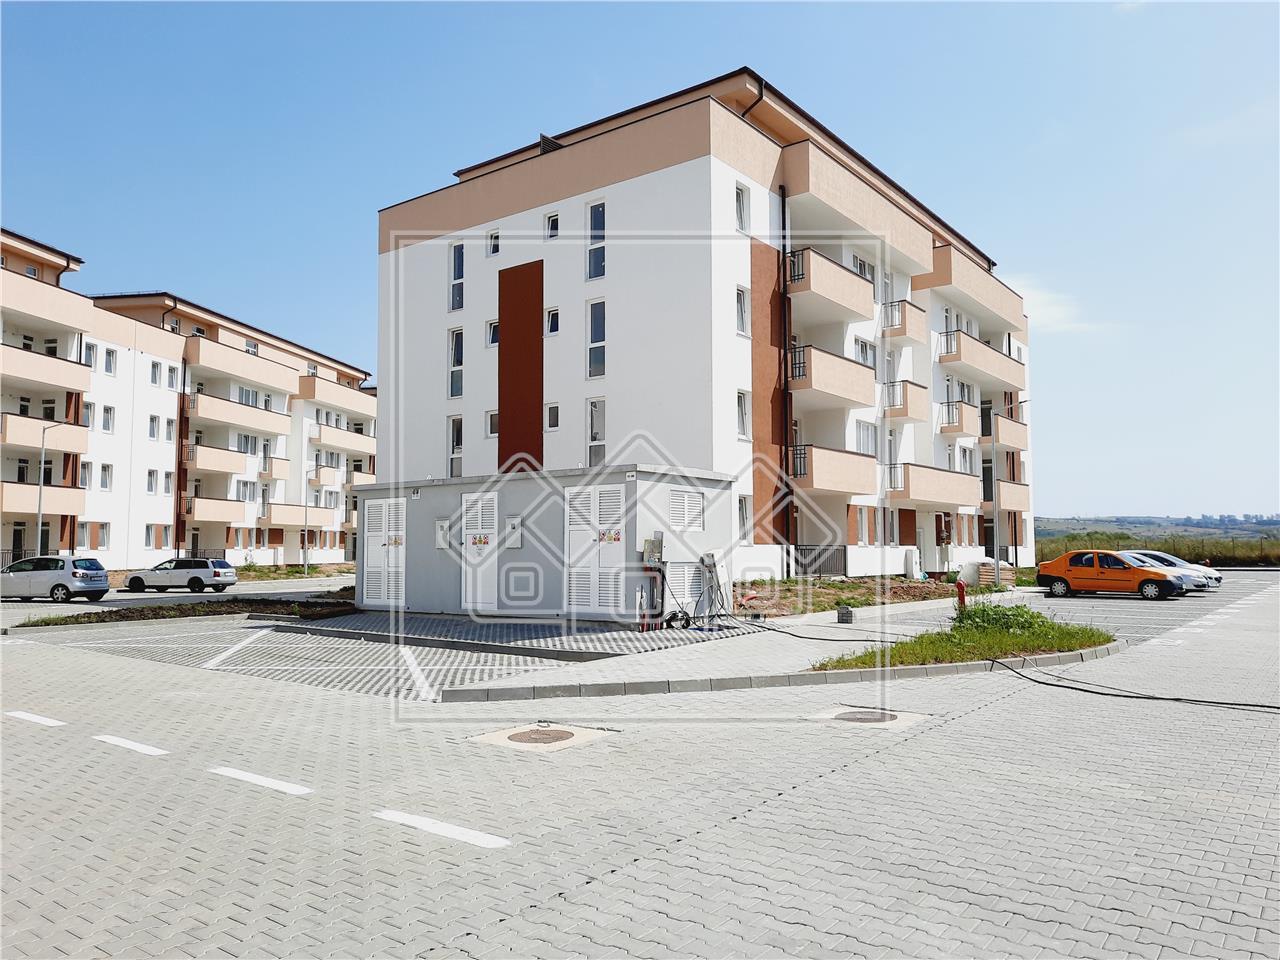 Garsoniera De Vanzare In Sibiu - Intabulata - La cheie - H. Coanda